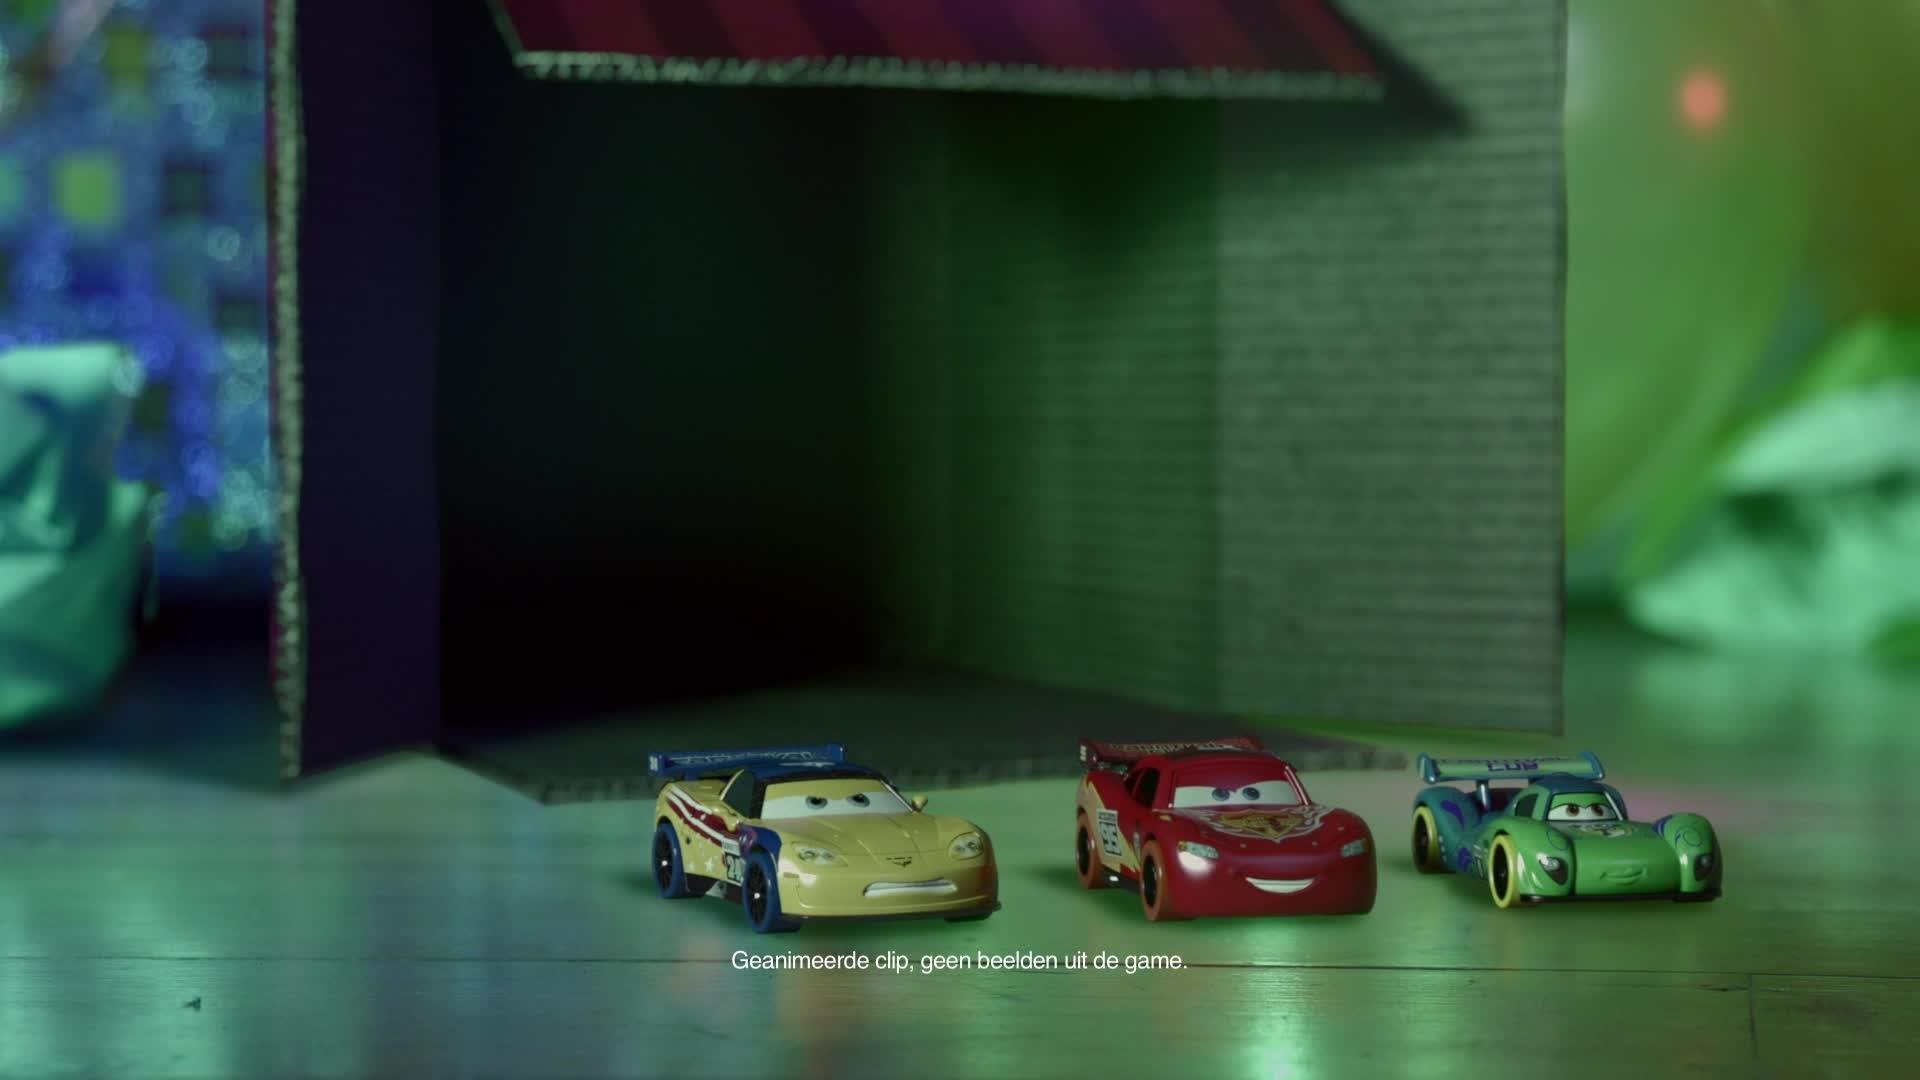 Cars Daredevil Garage - Testrit in de Woonkamer